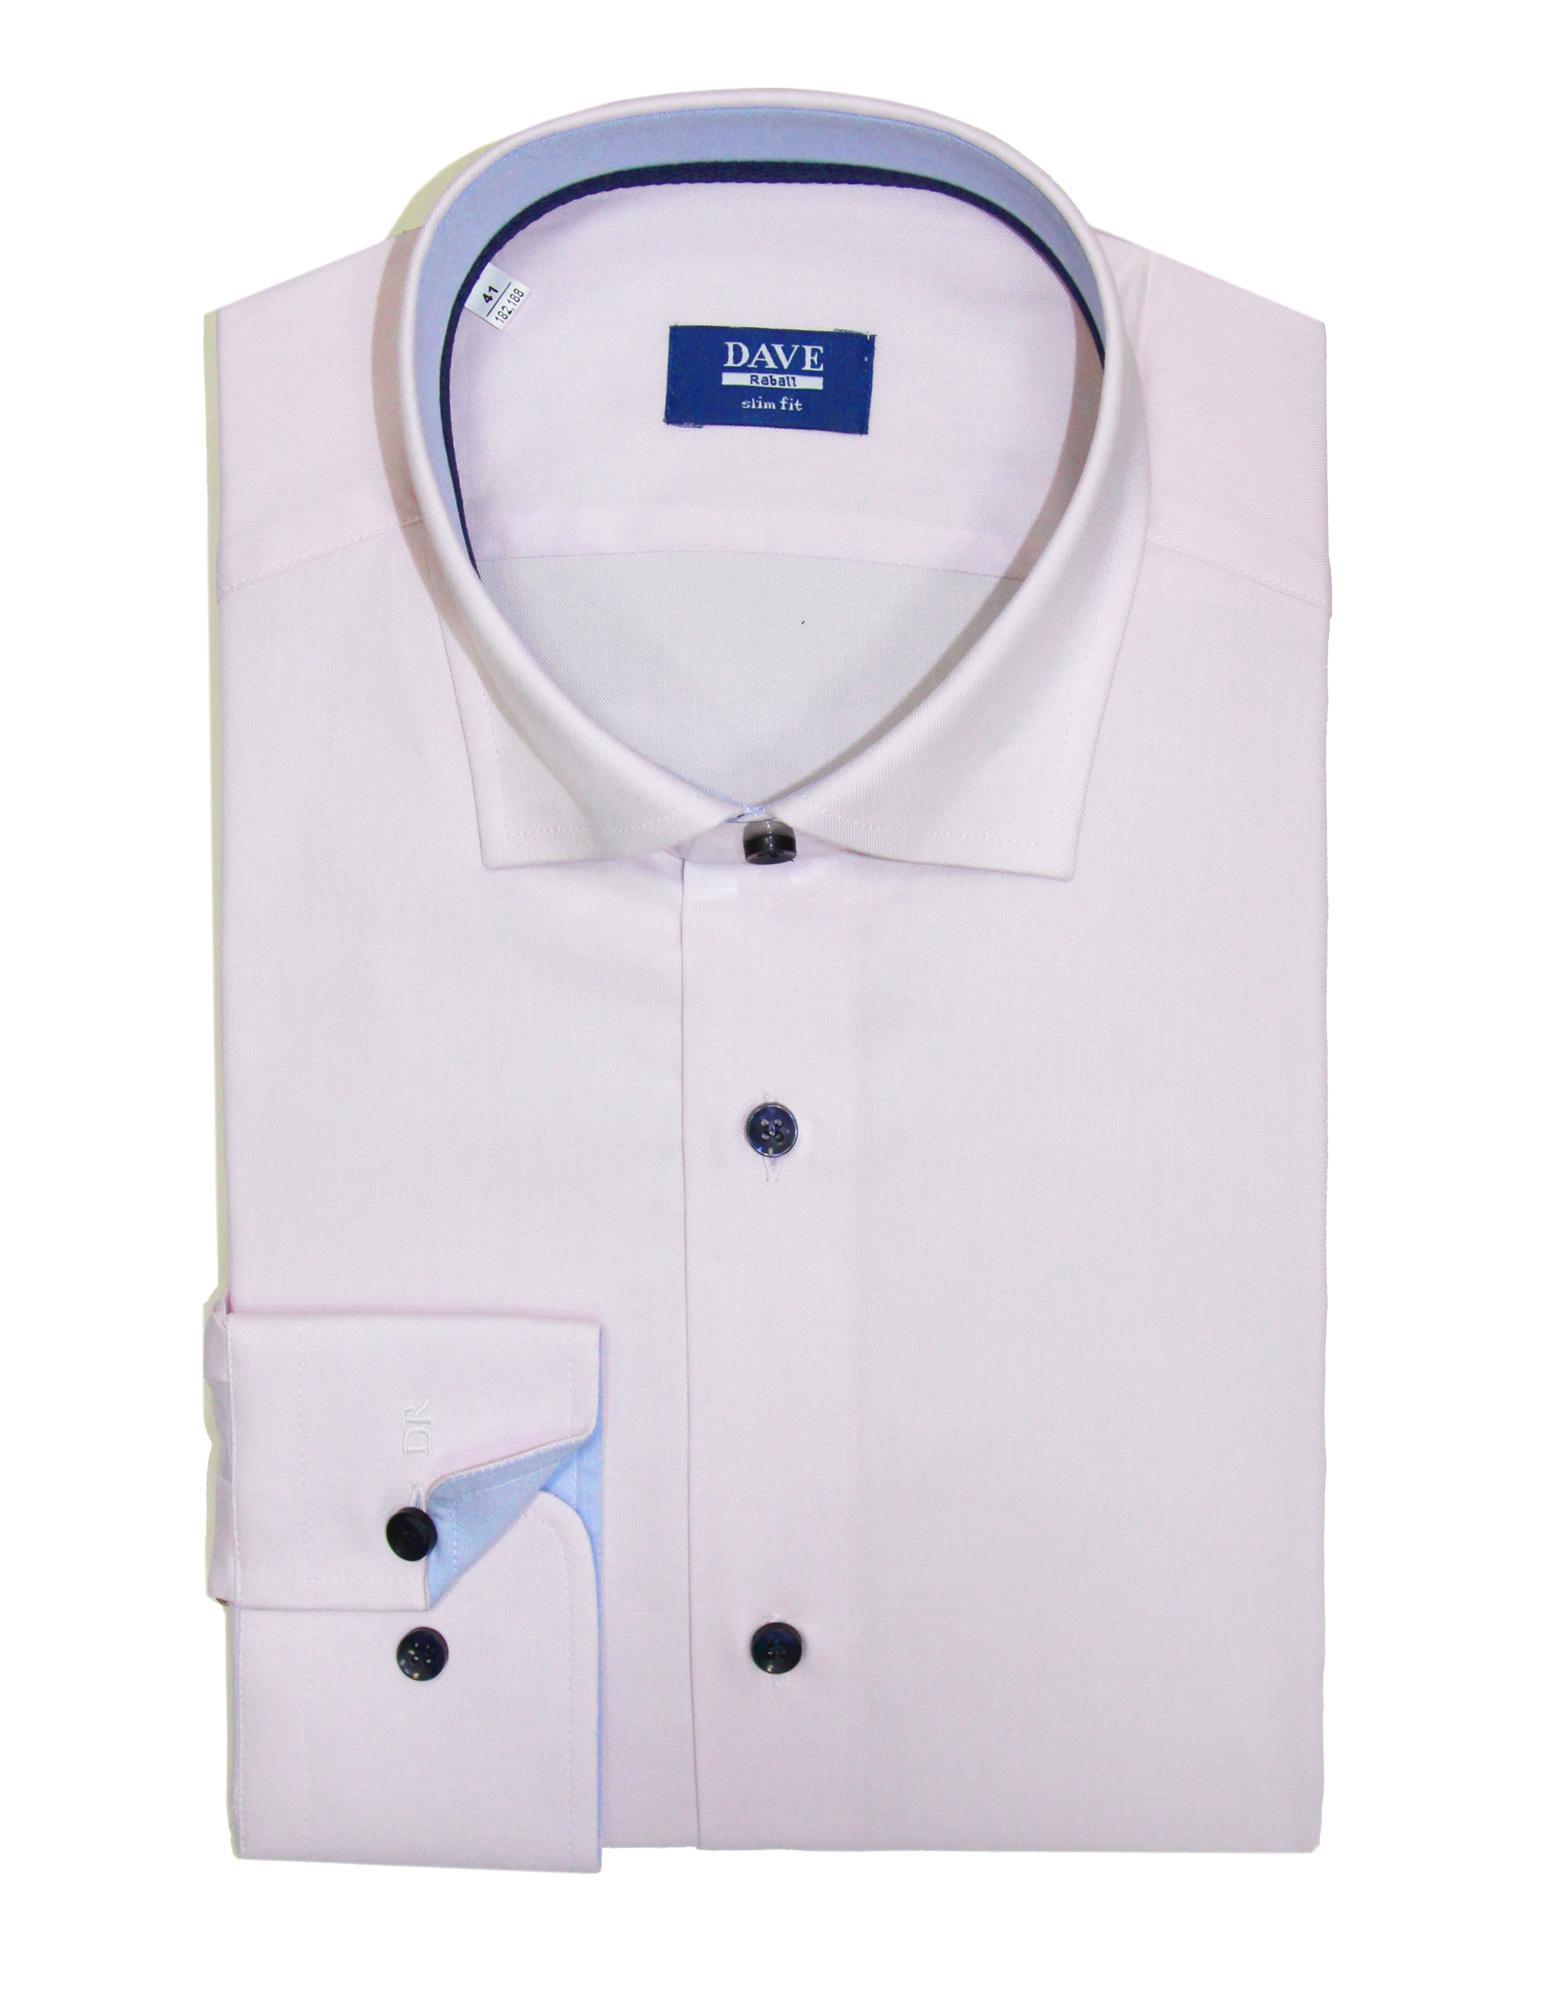 Фото - Рубашка Dave Raball рубашка dave raball голубой 40 размер